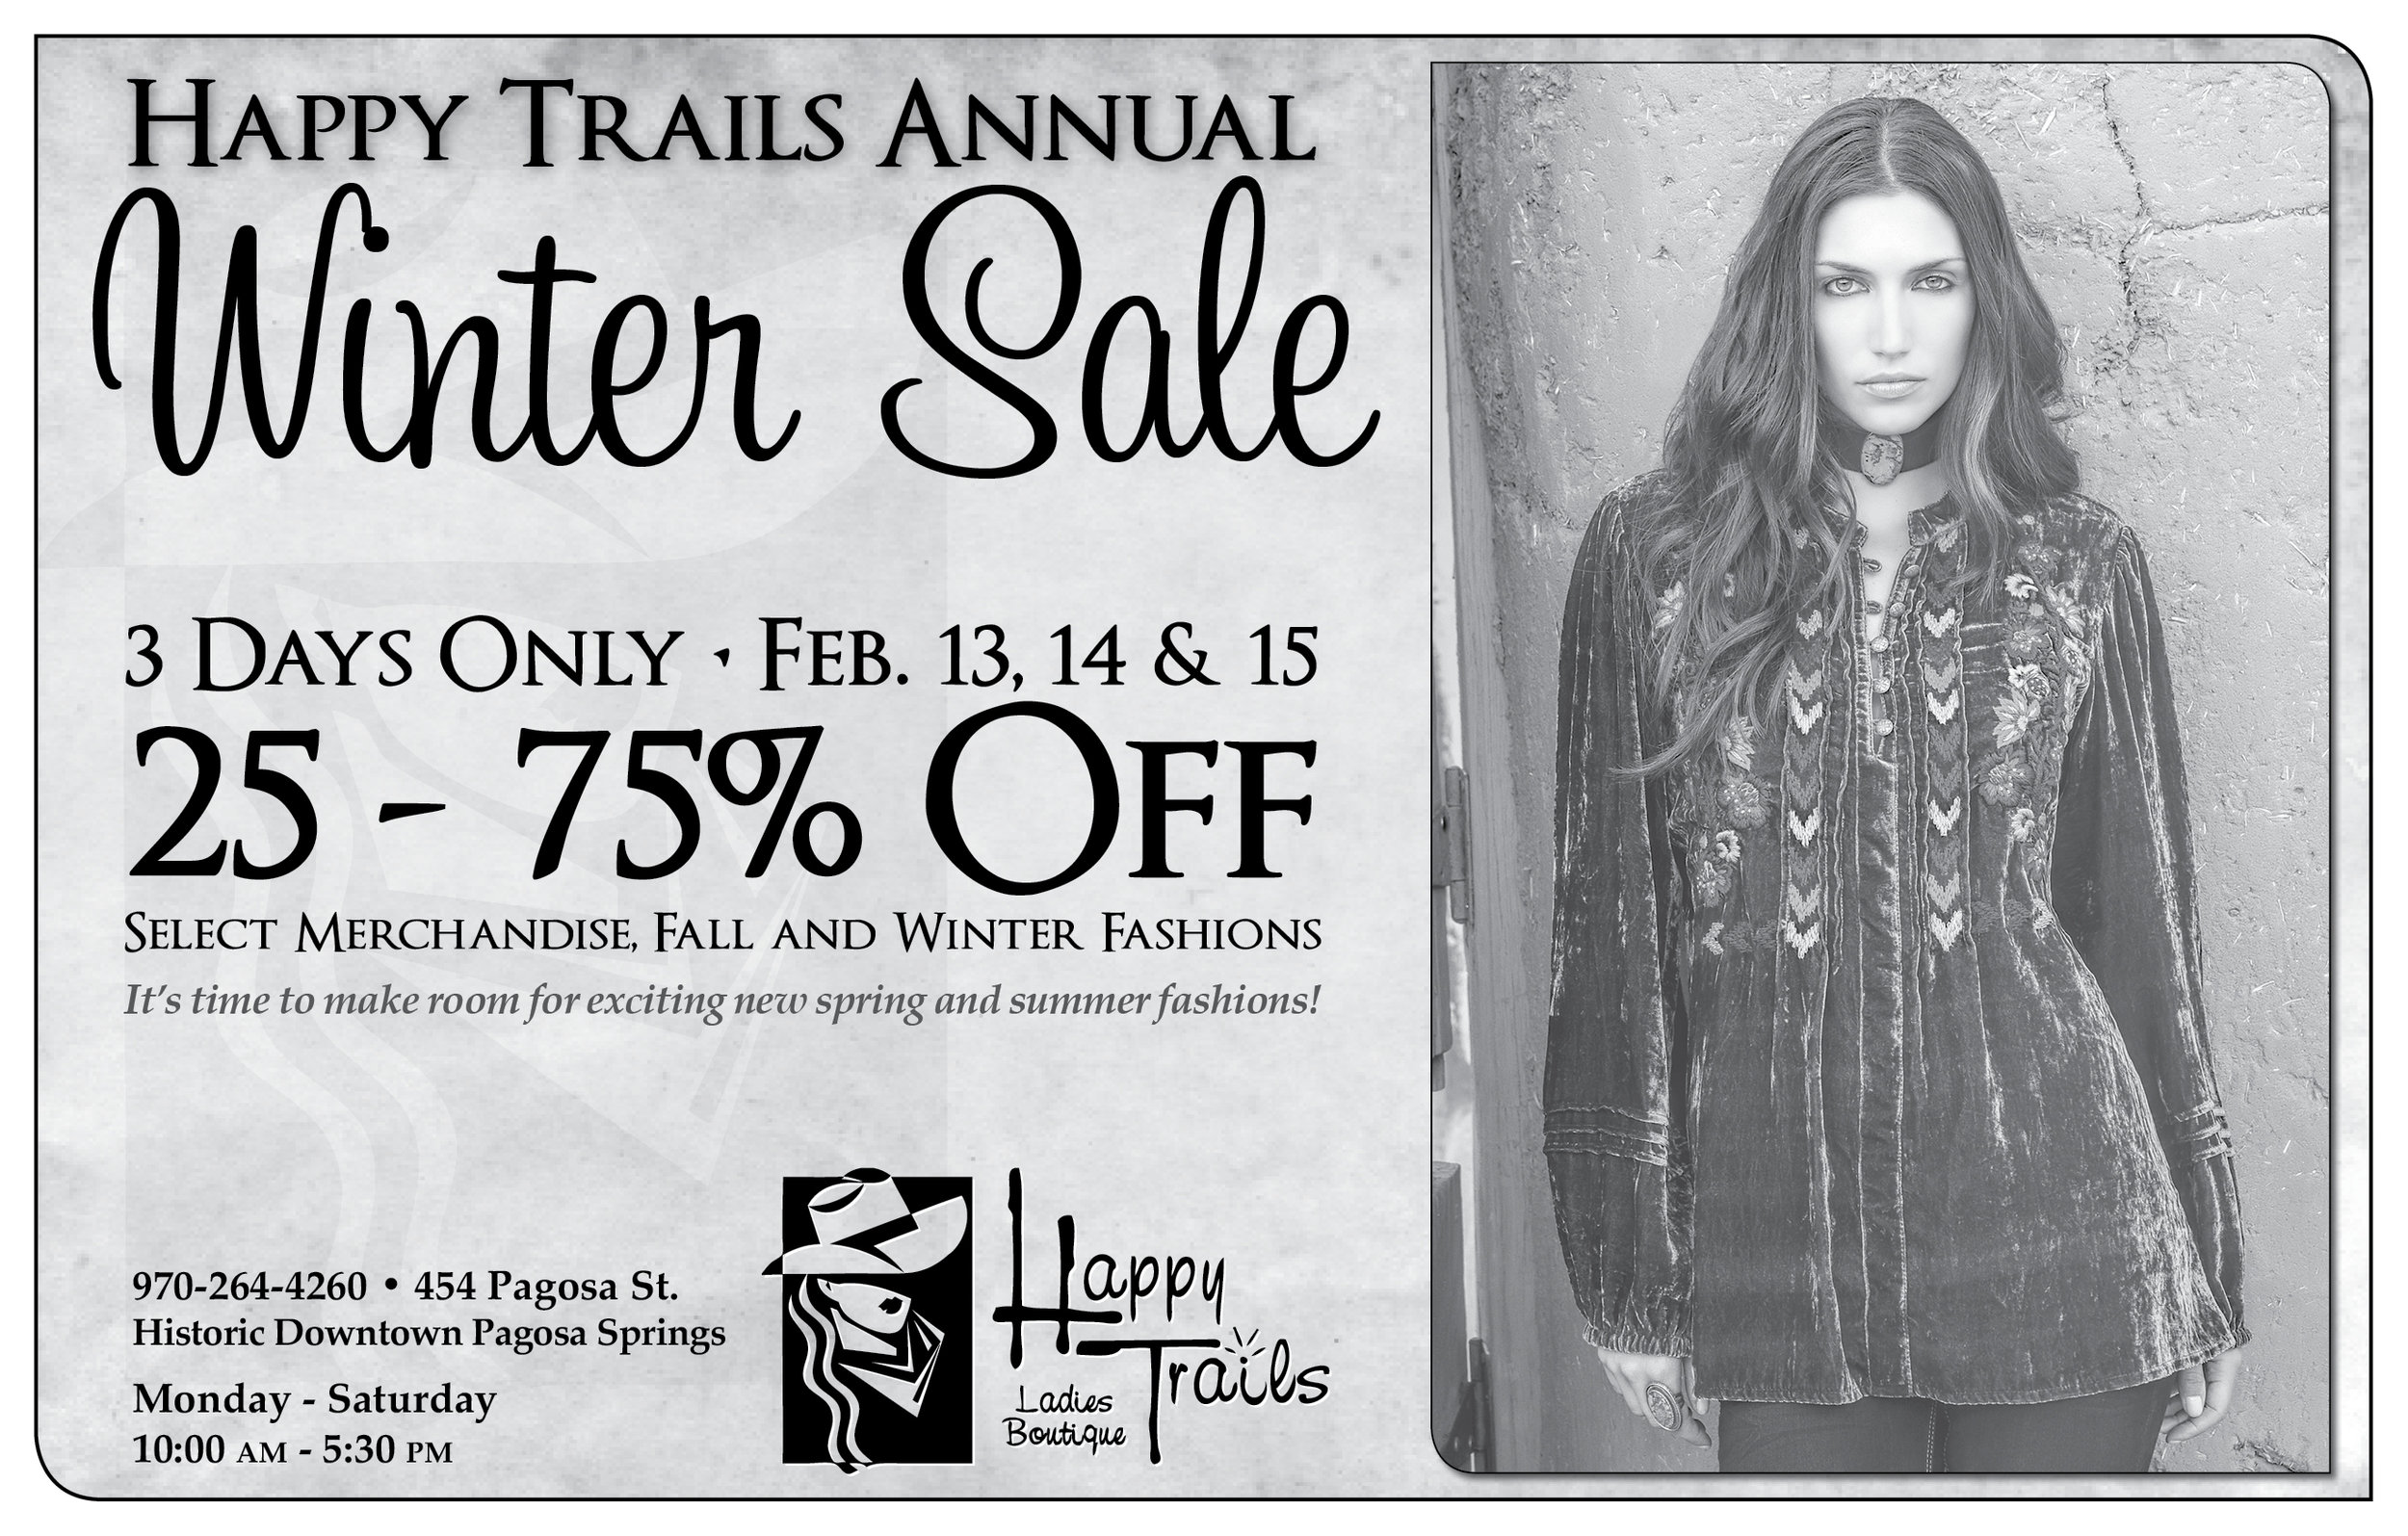 happy trails winter sale 2.13.14.jpg